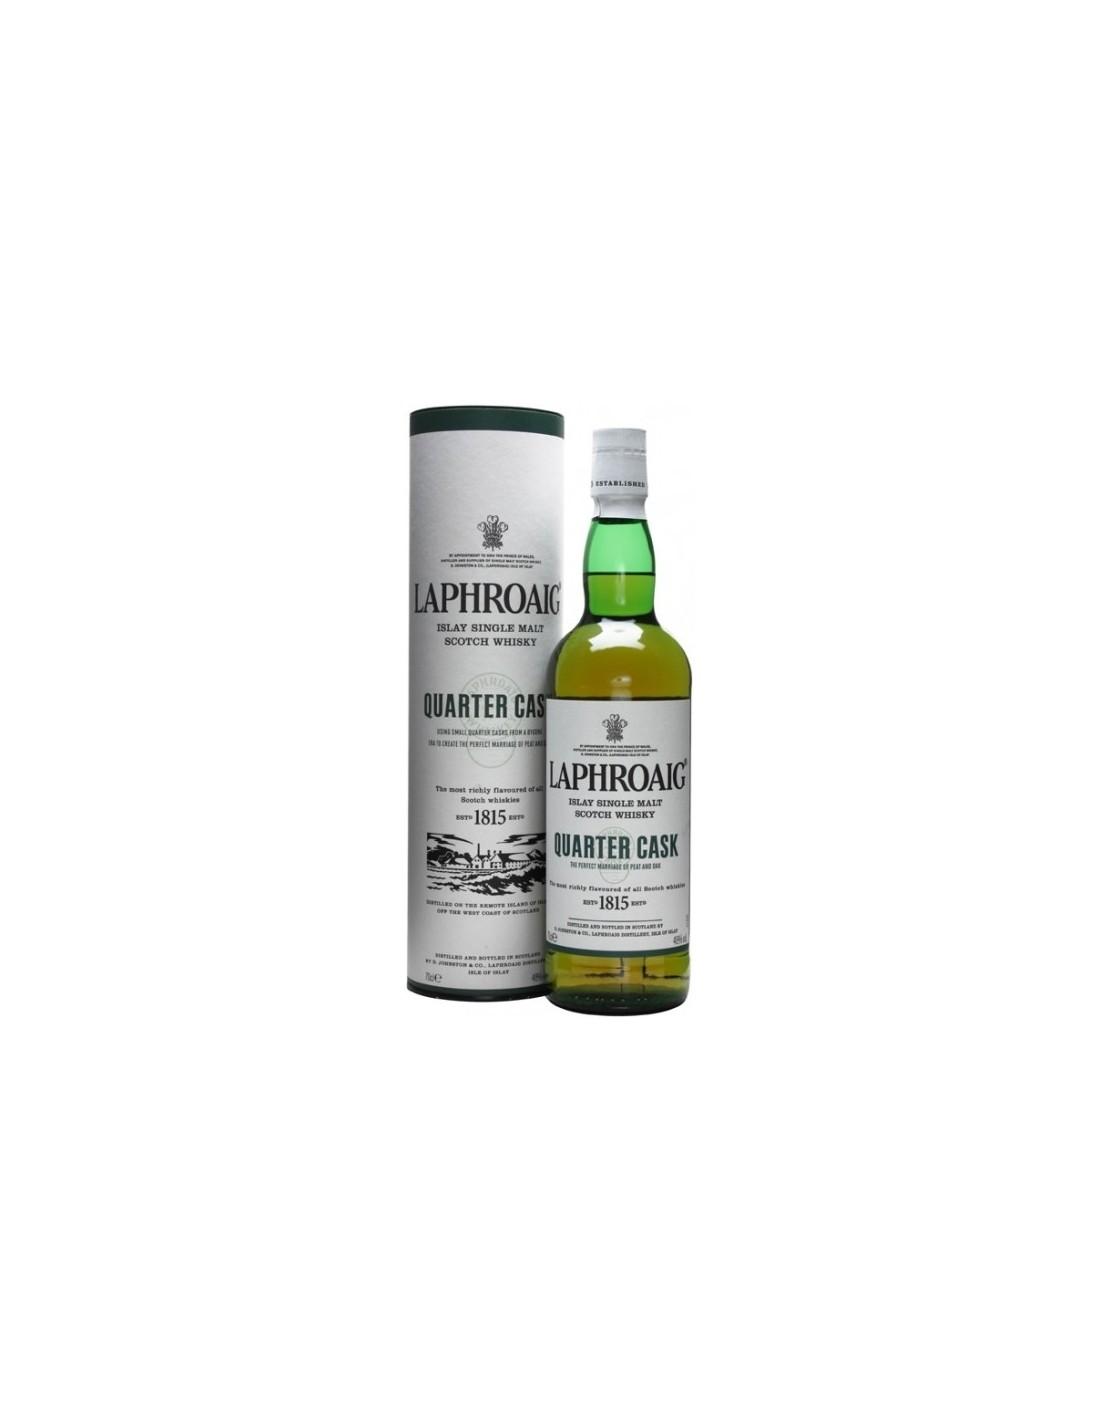 Whisky Laphroaig Quarter Cask, 48% alc., 0.7L, Scotia